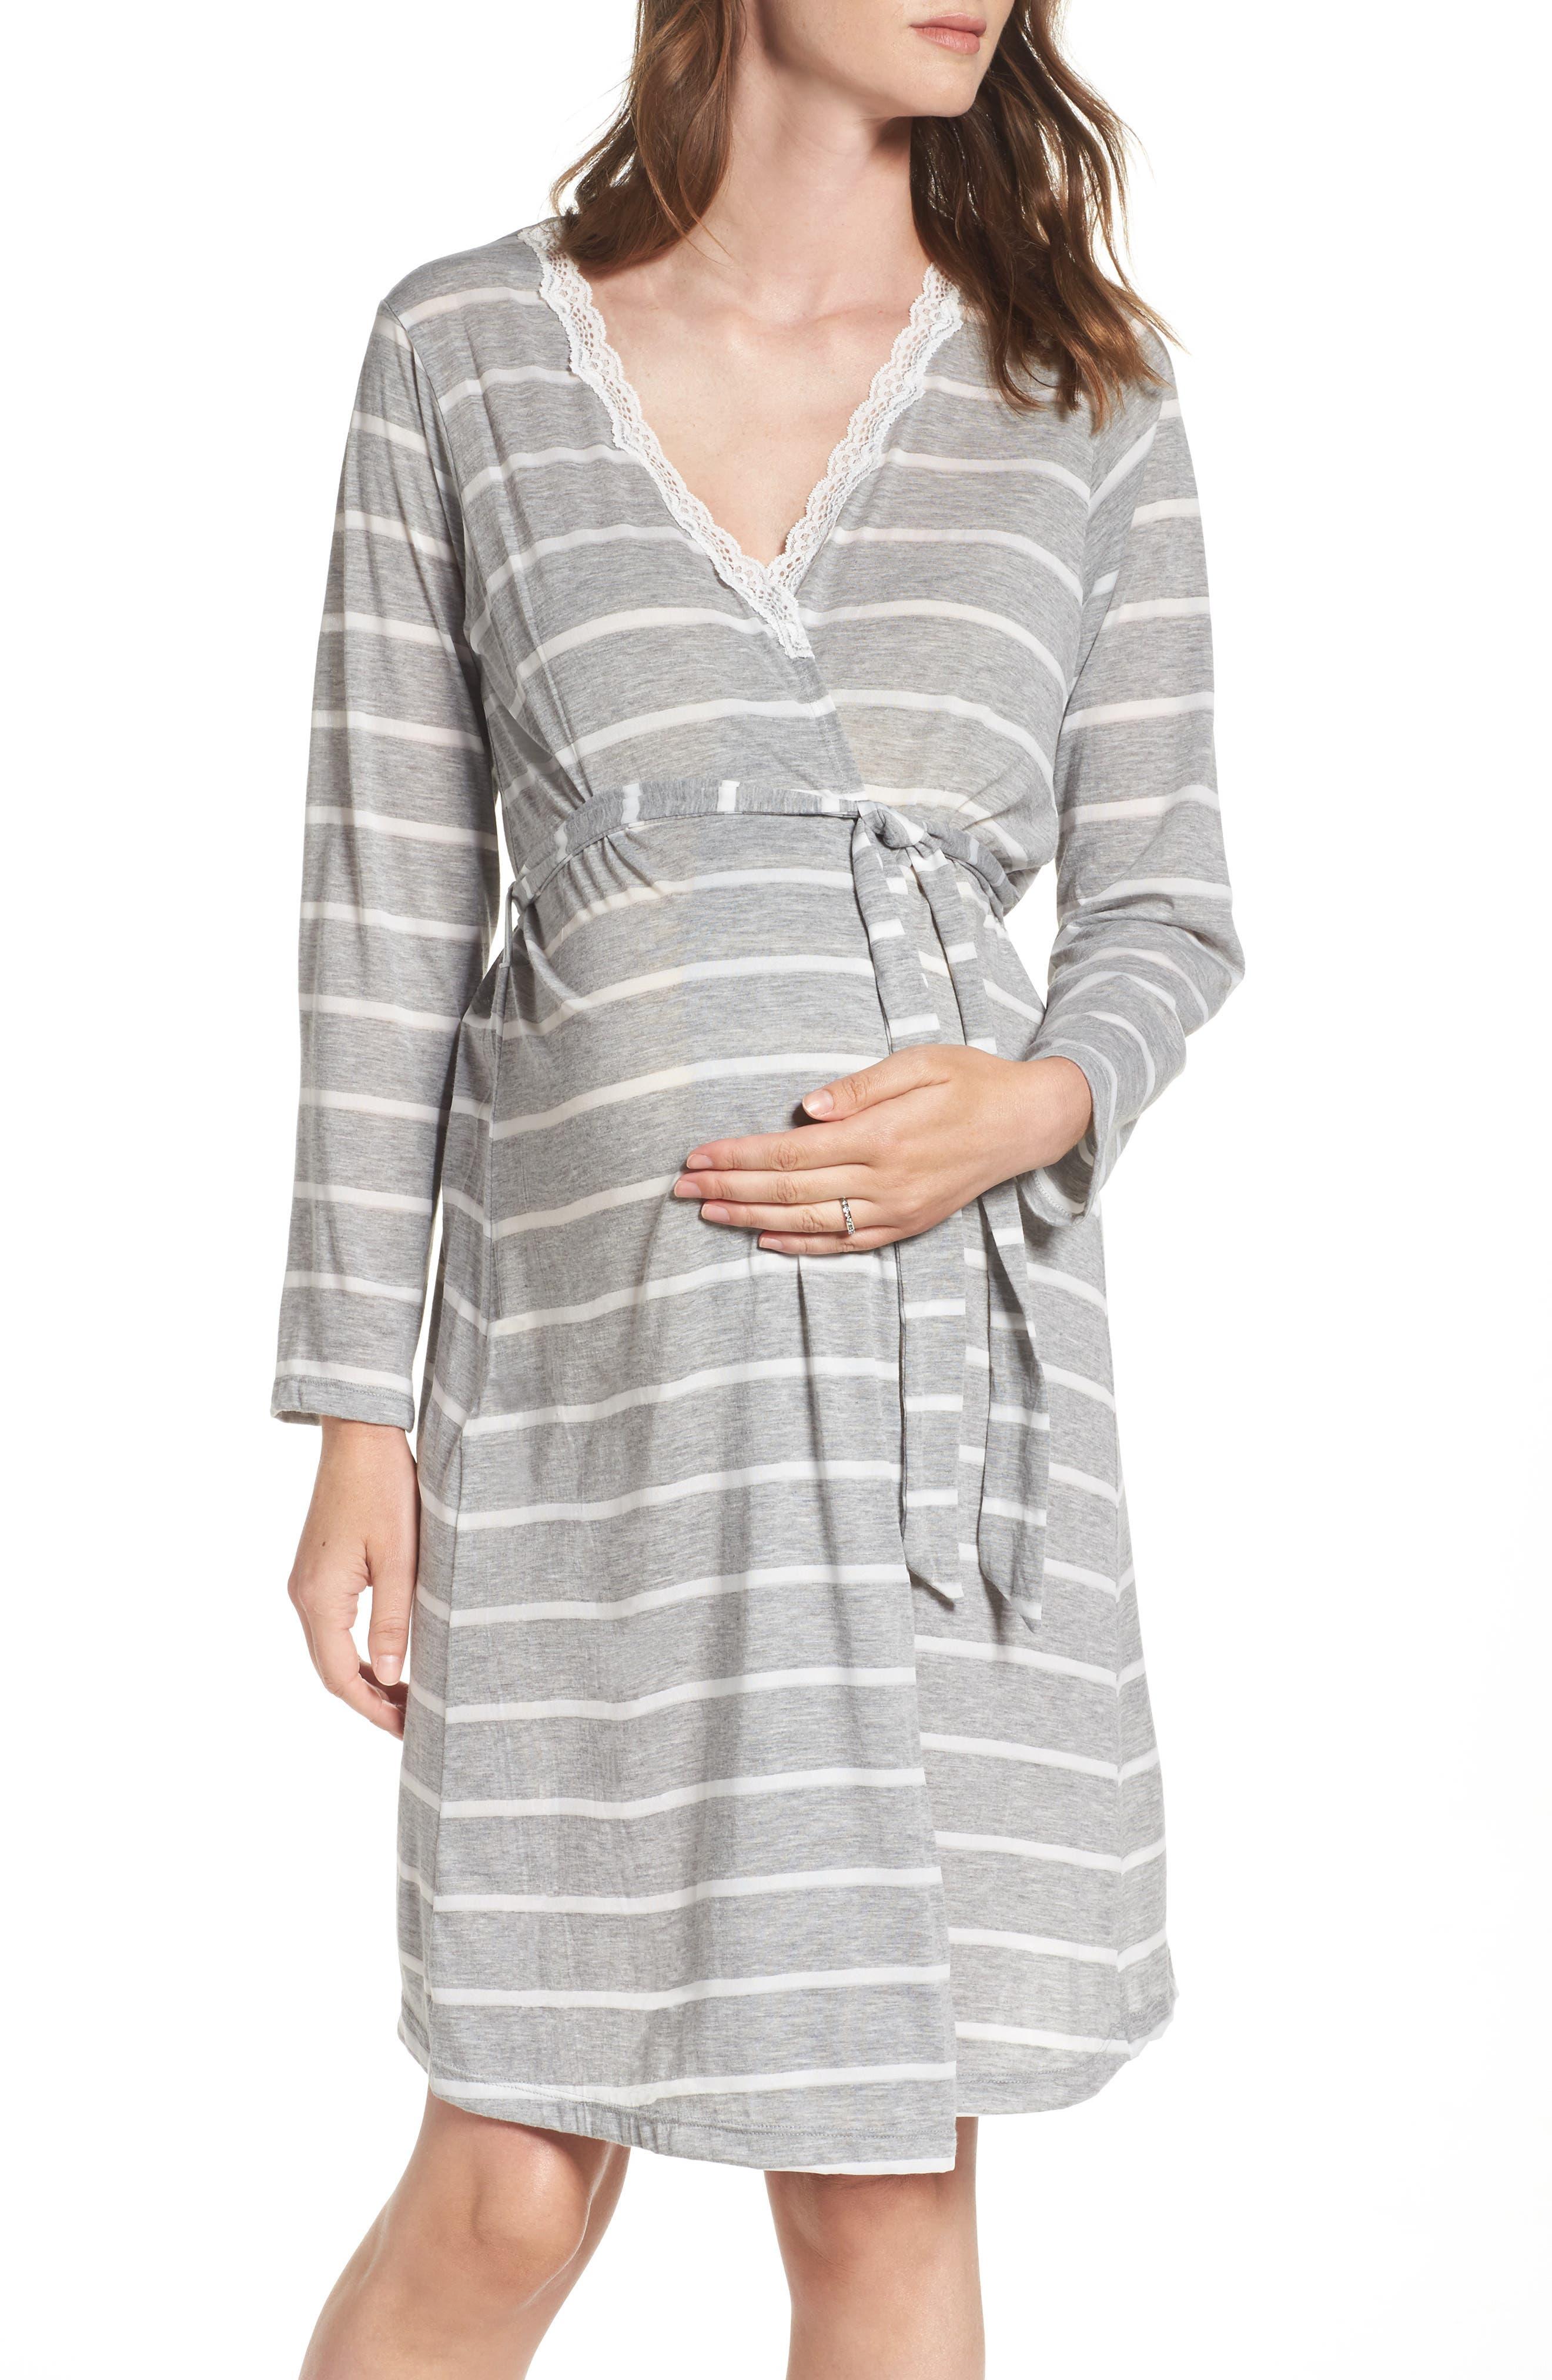 Heather Maternity Robe,                         Main,                         color, Grey Stripe